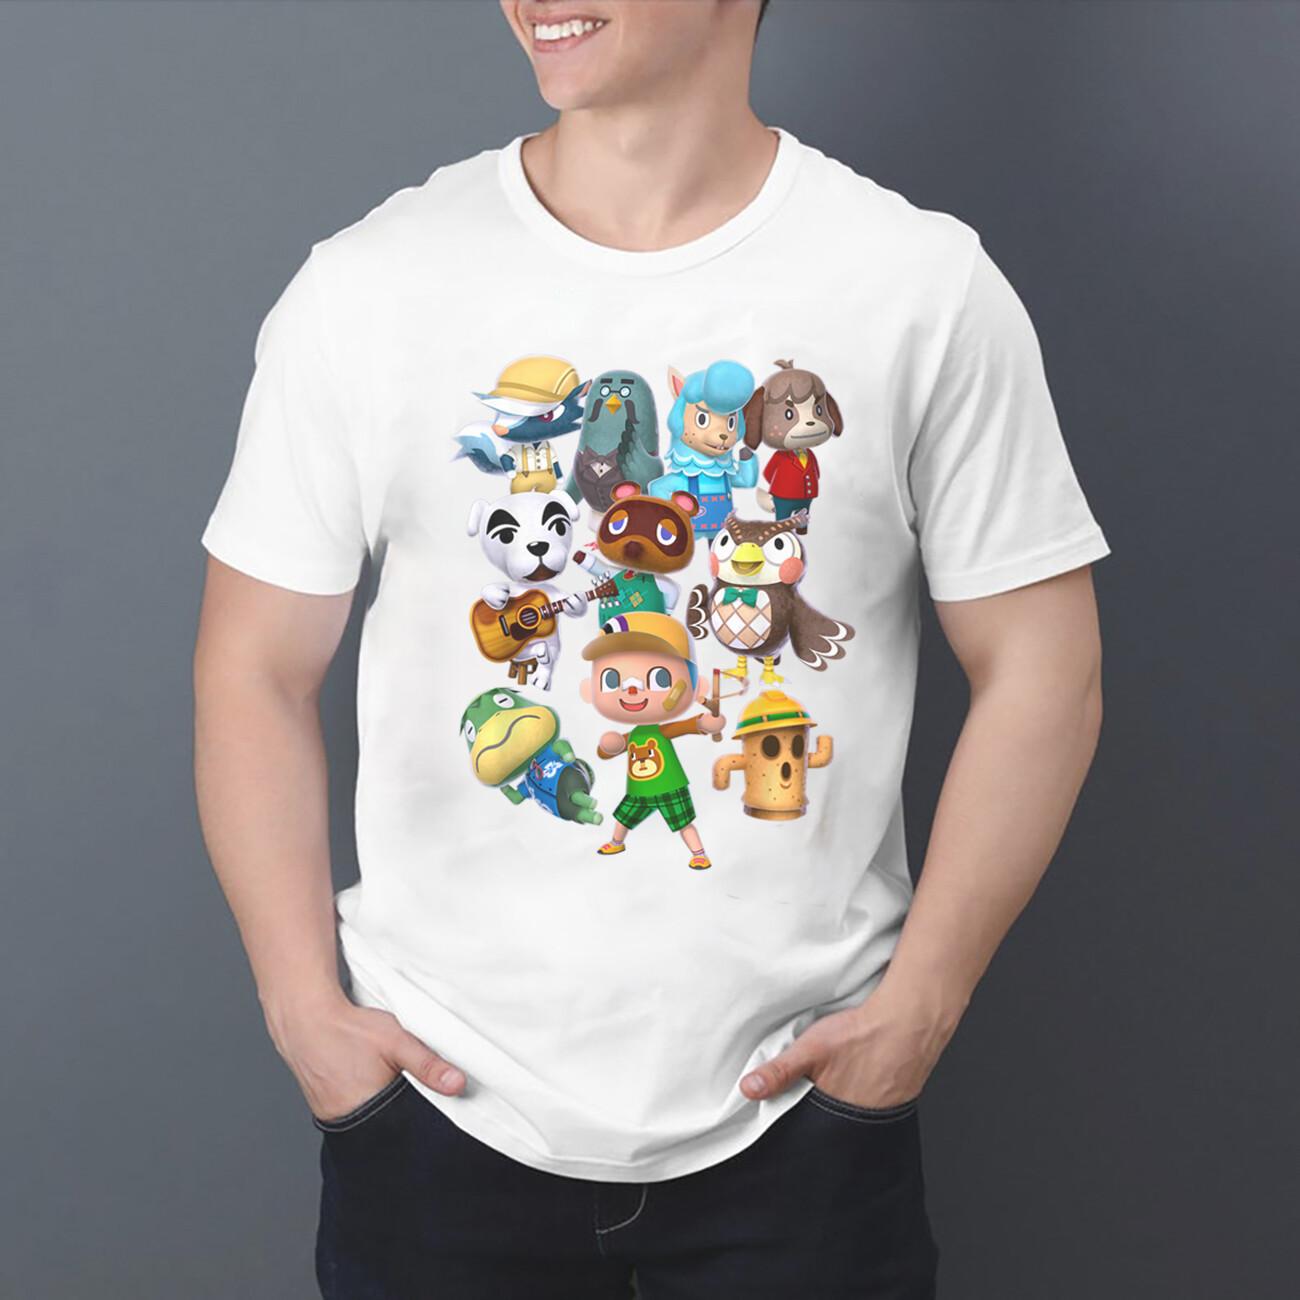 Animal Crossing Characters T-Shirt short-Sleeve Long-Sleeve V-Neck Tank Hoodie Sweatshirt Men Women Tee Gifts